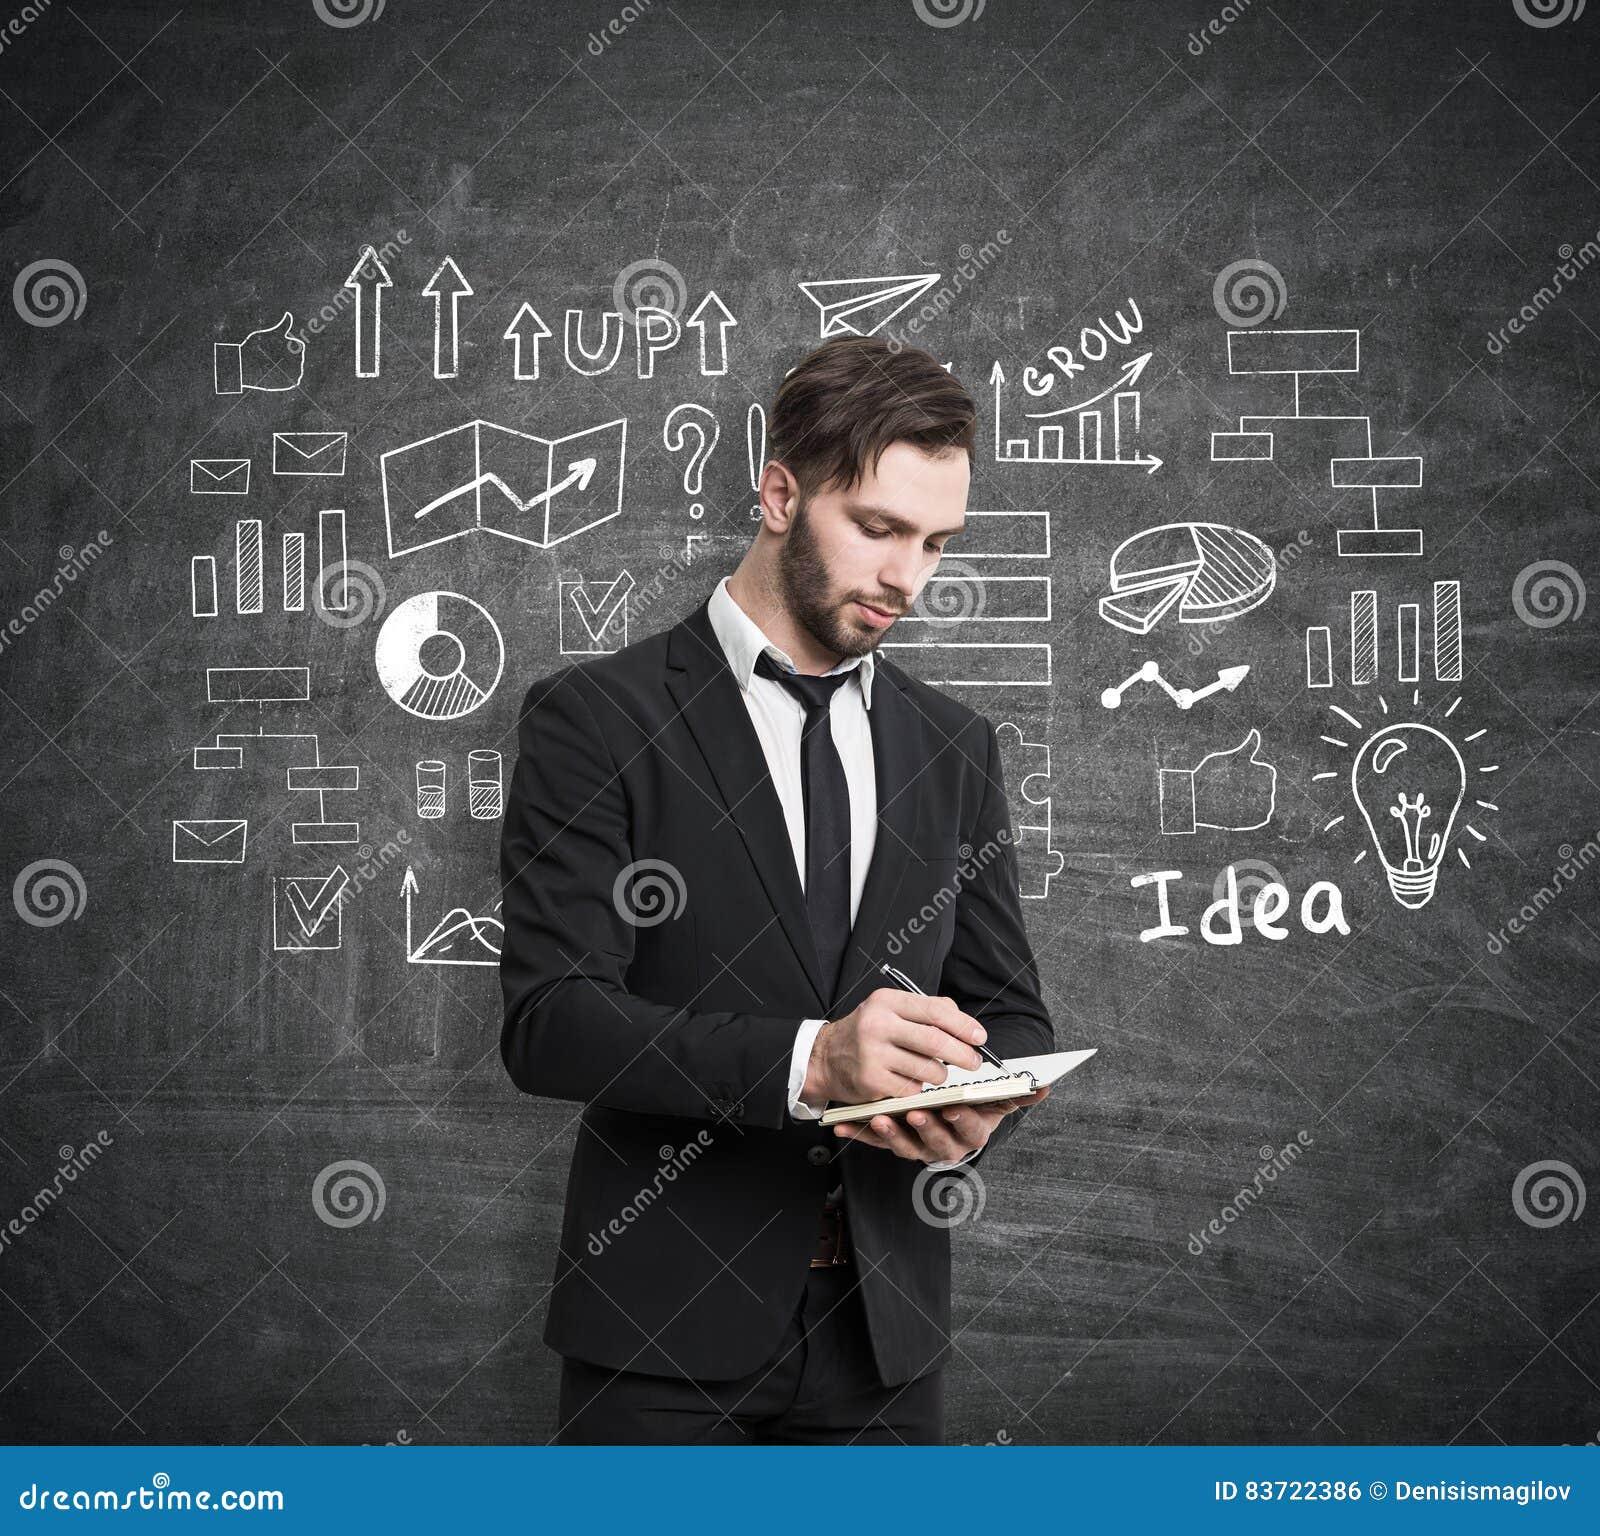 business plan writers near me